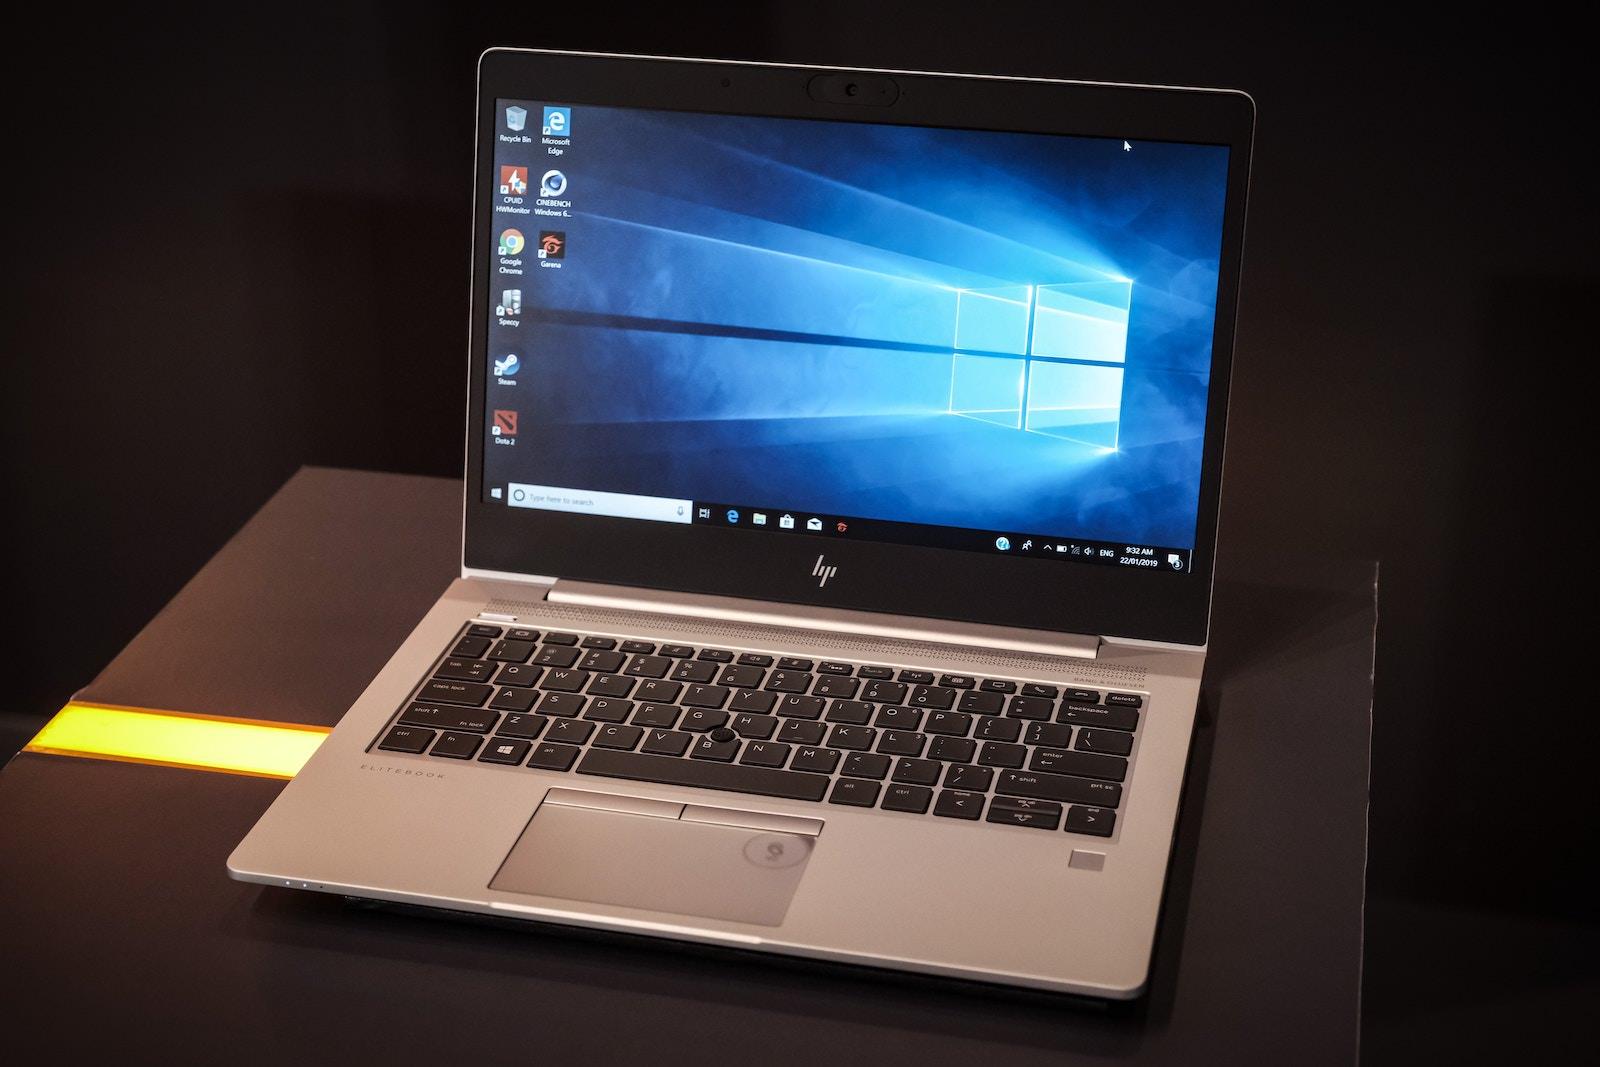 Windowx Laptop